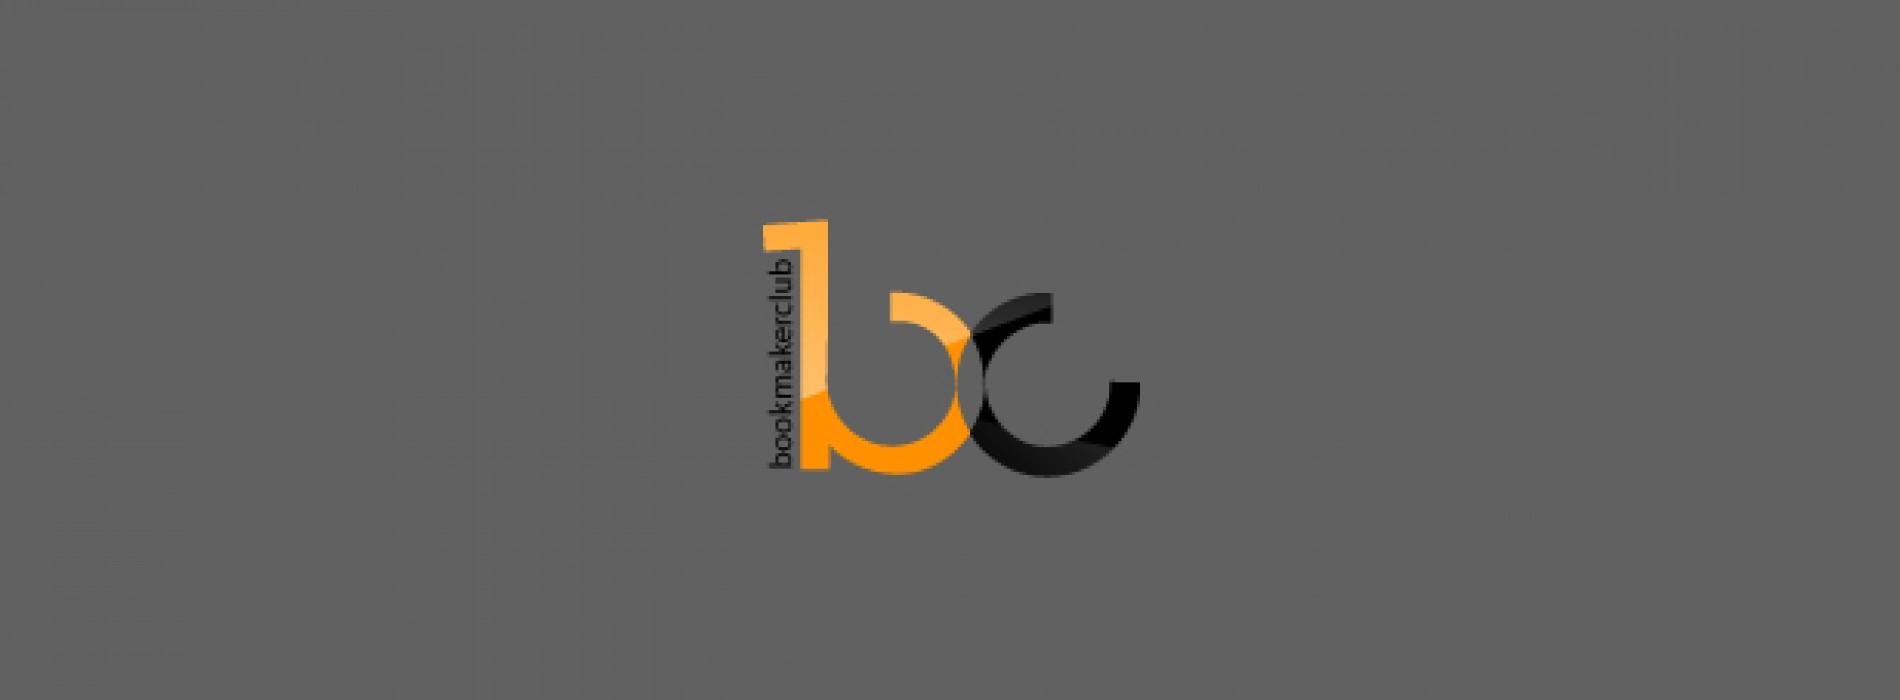 Обзор БК Bookmakerclub